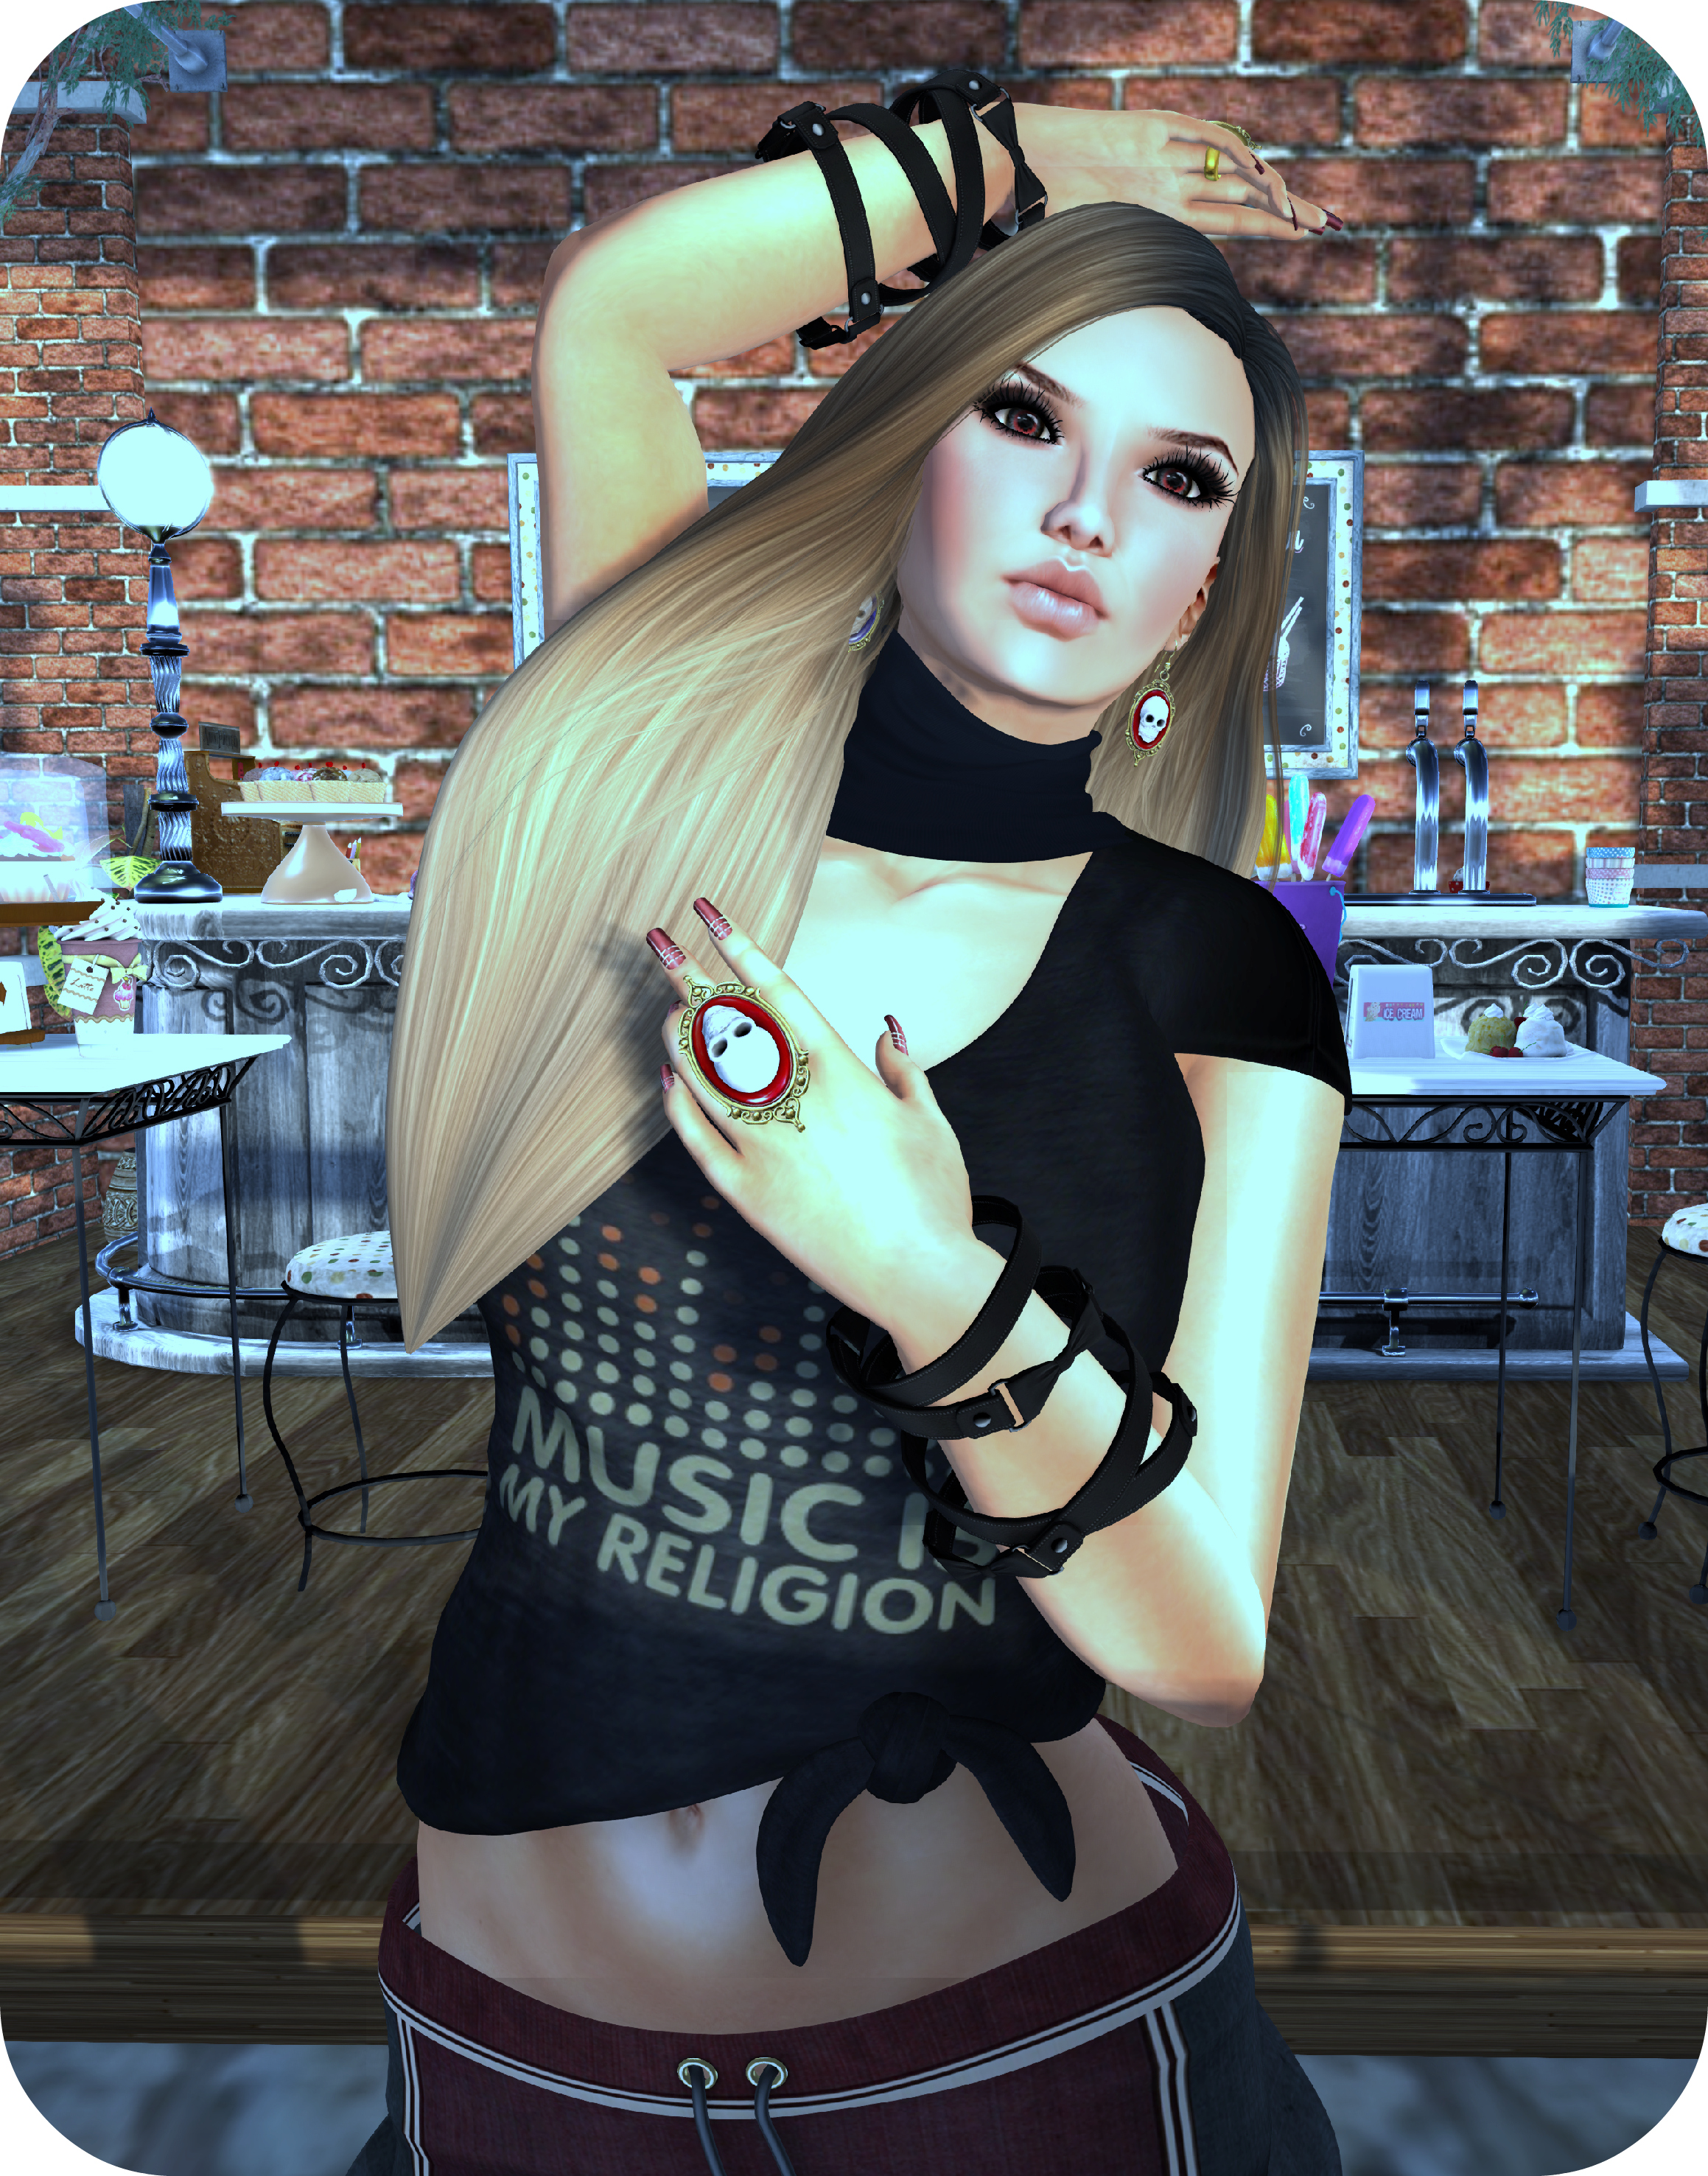 Tameless, 7Deadly, AG, DS, MG, Bracelets, Kicks,EP #3_cropped